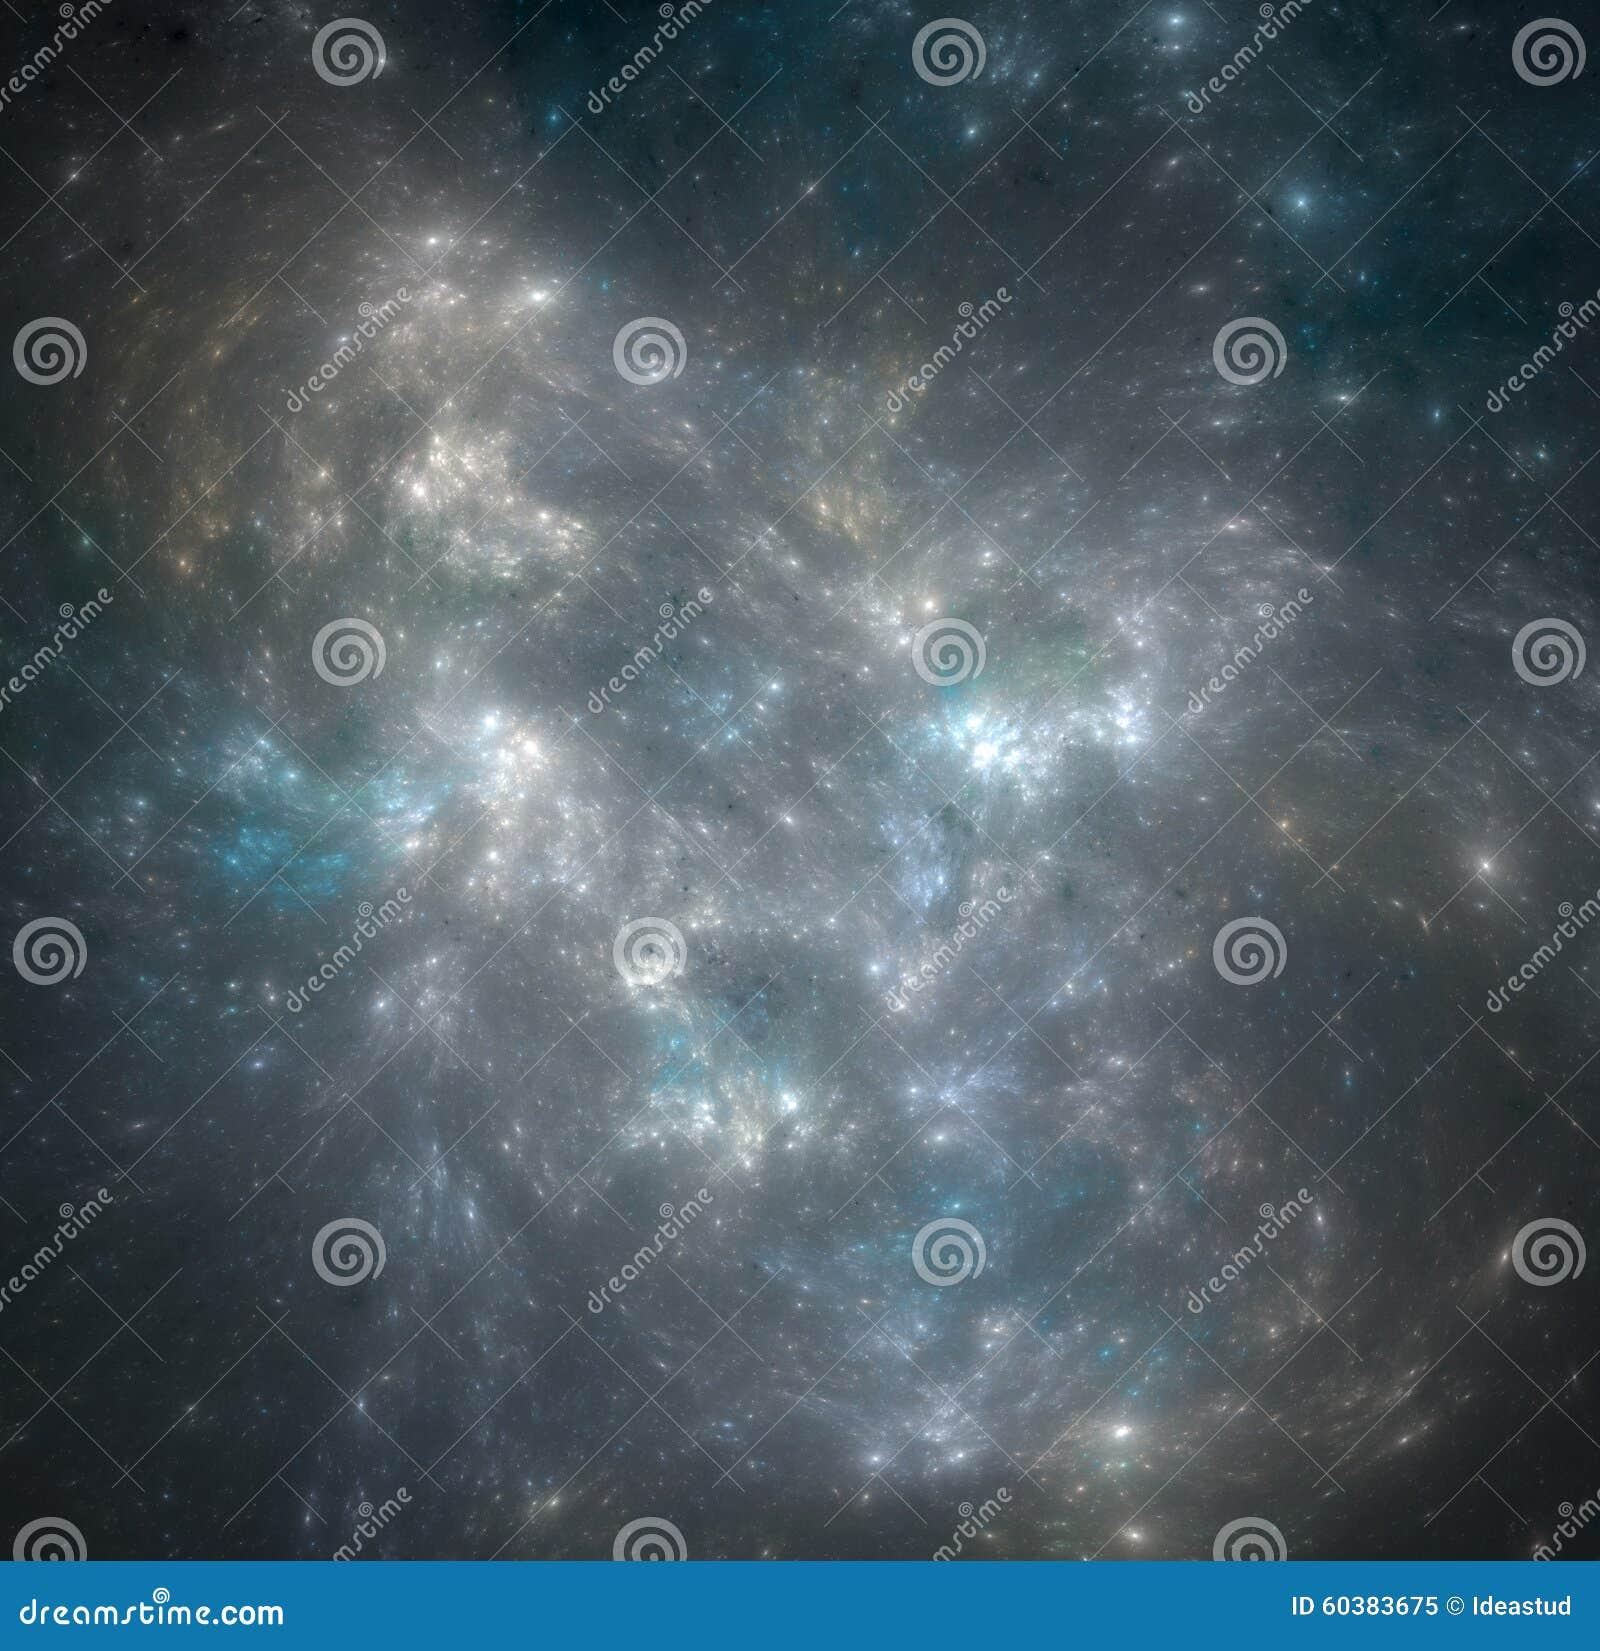 illustration fractal background clocks - photo #15